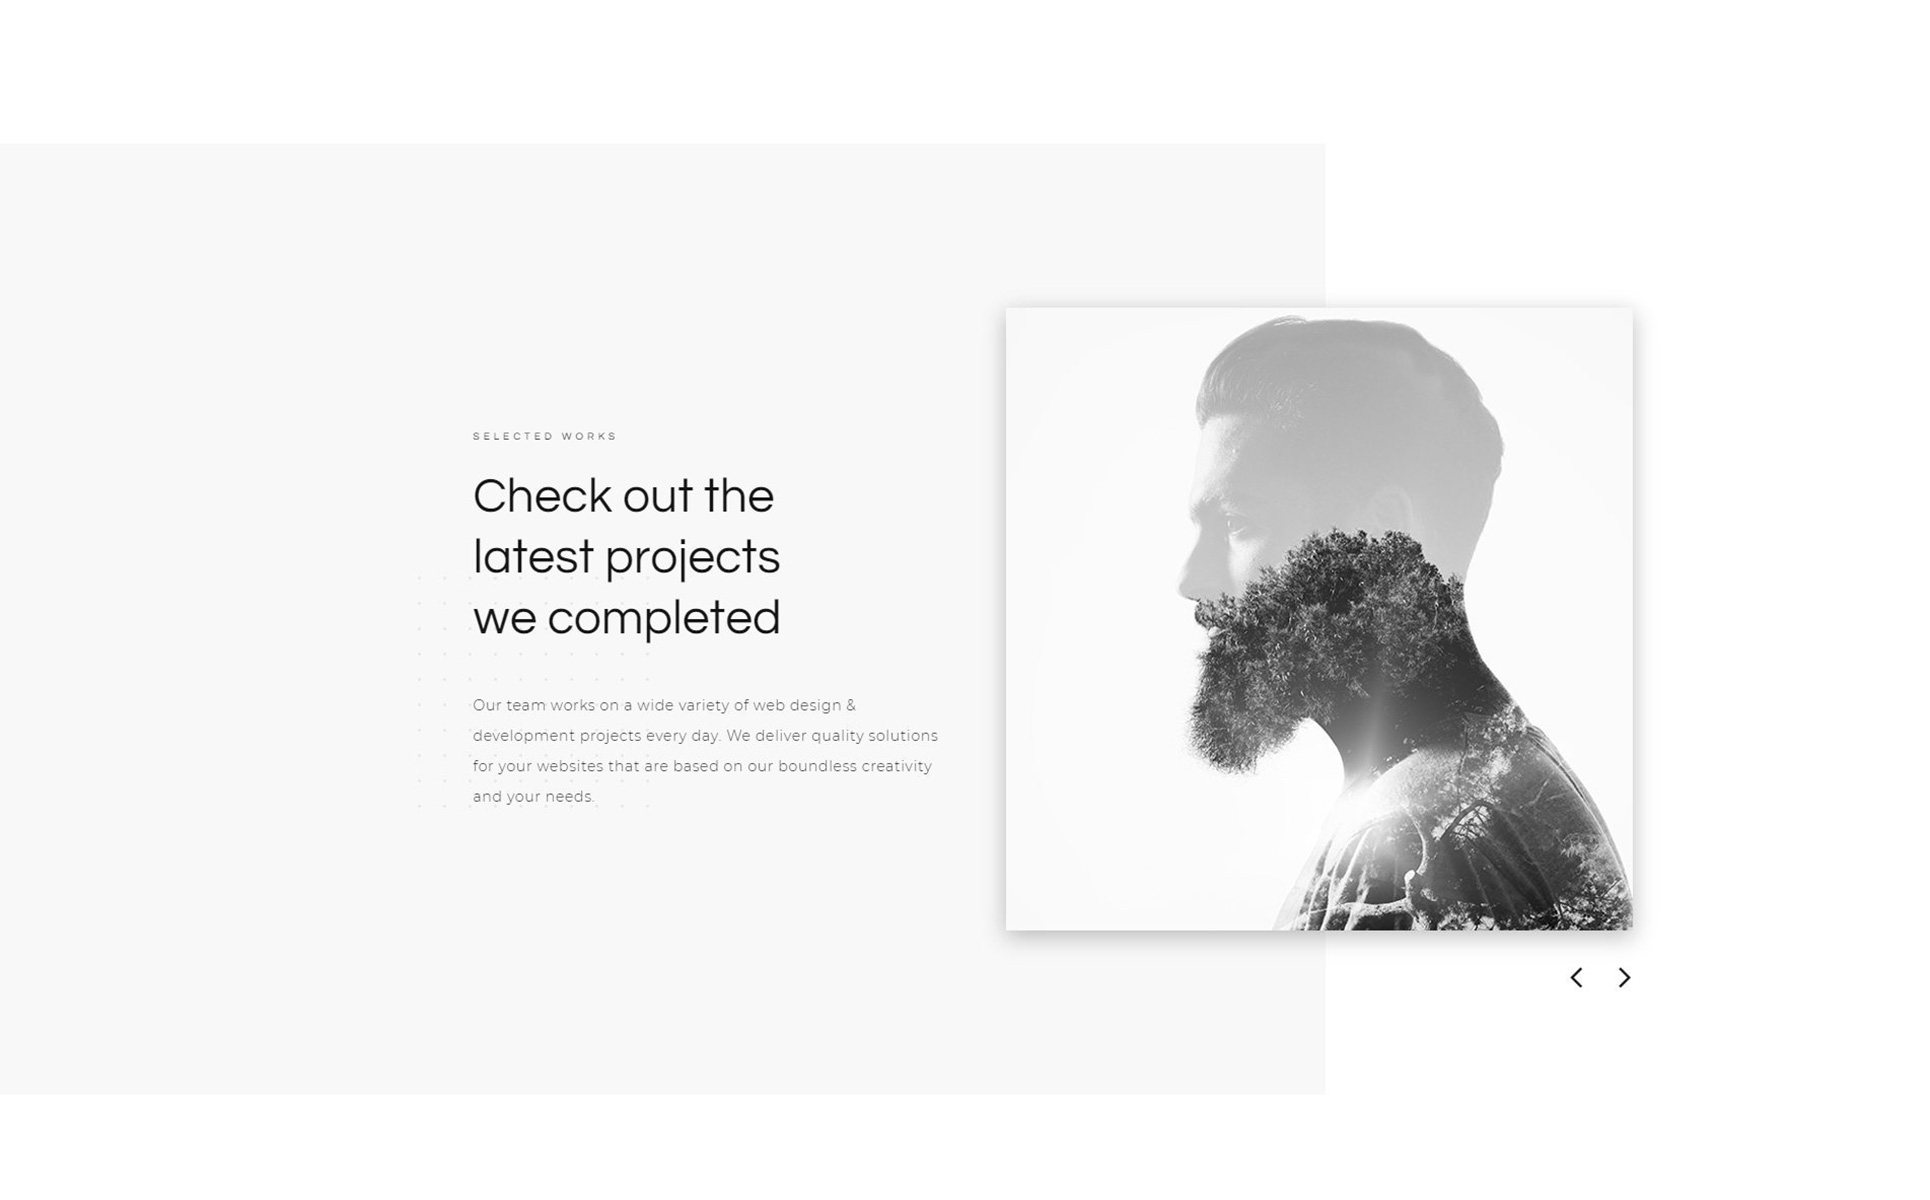 https://s3.tmimgcdn.com/templates/15839/scr/1542119619279_image-2.jpg